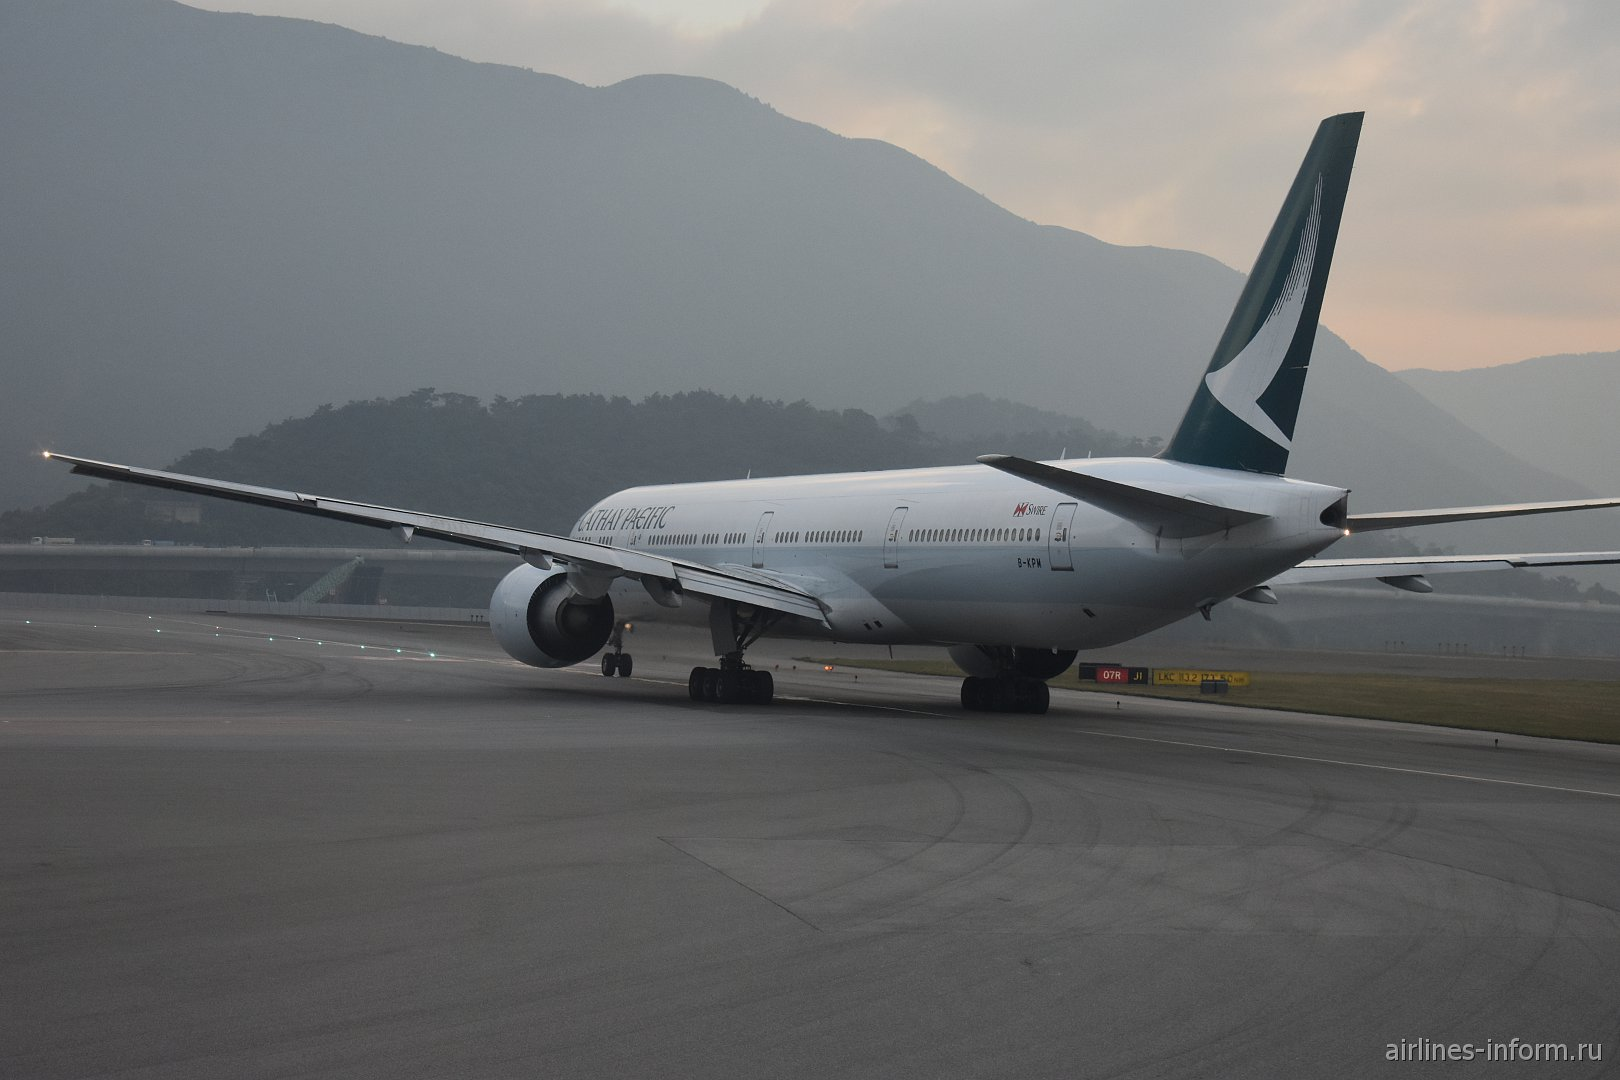 Боинг-777-300 авиакомпании Cathay Pacific перед взлетом в аэропорту Гонконга